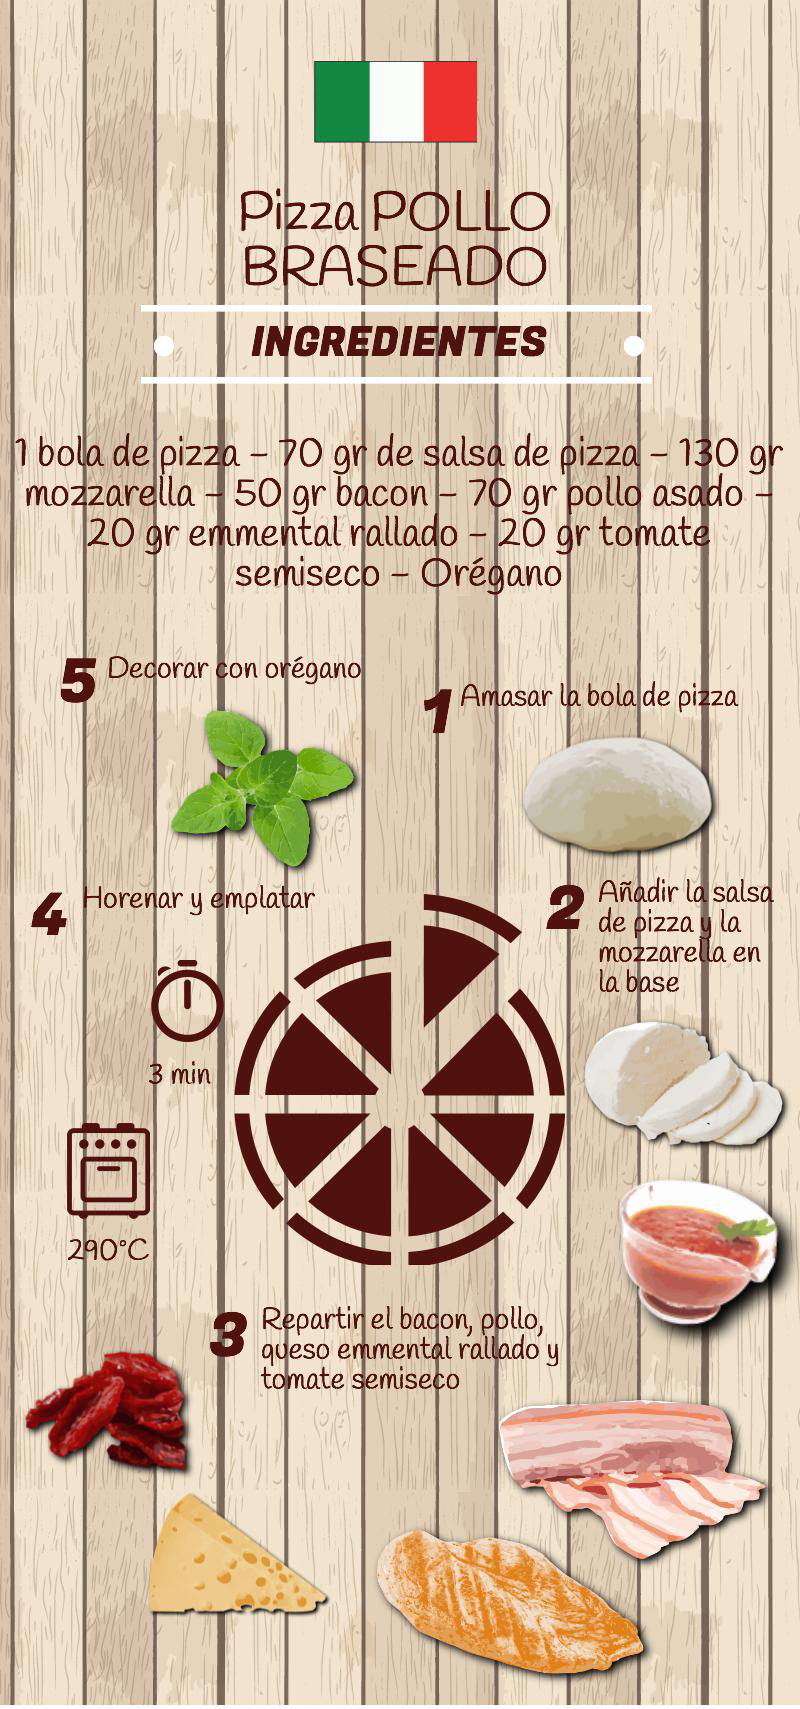 pollo braseado - Pizza Pollo Braseado